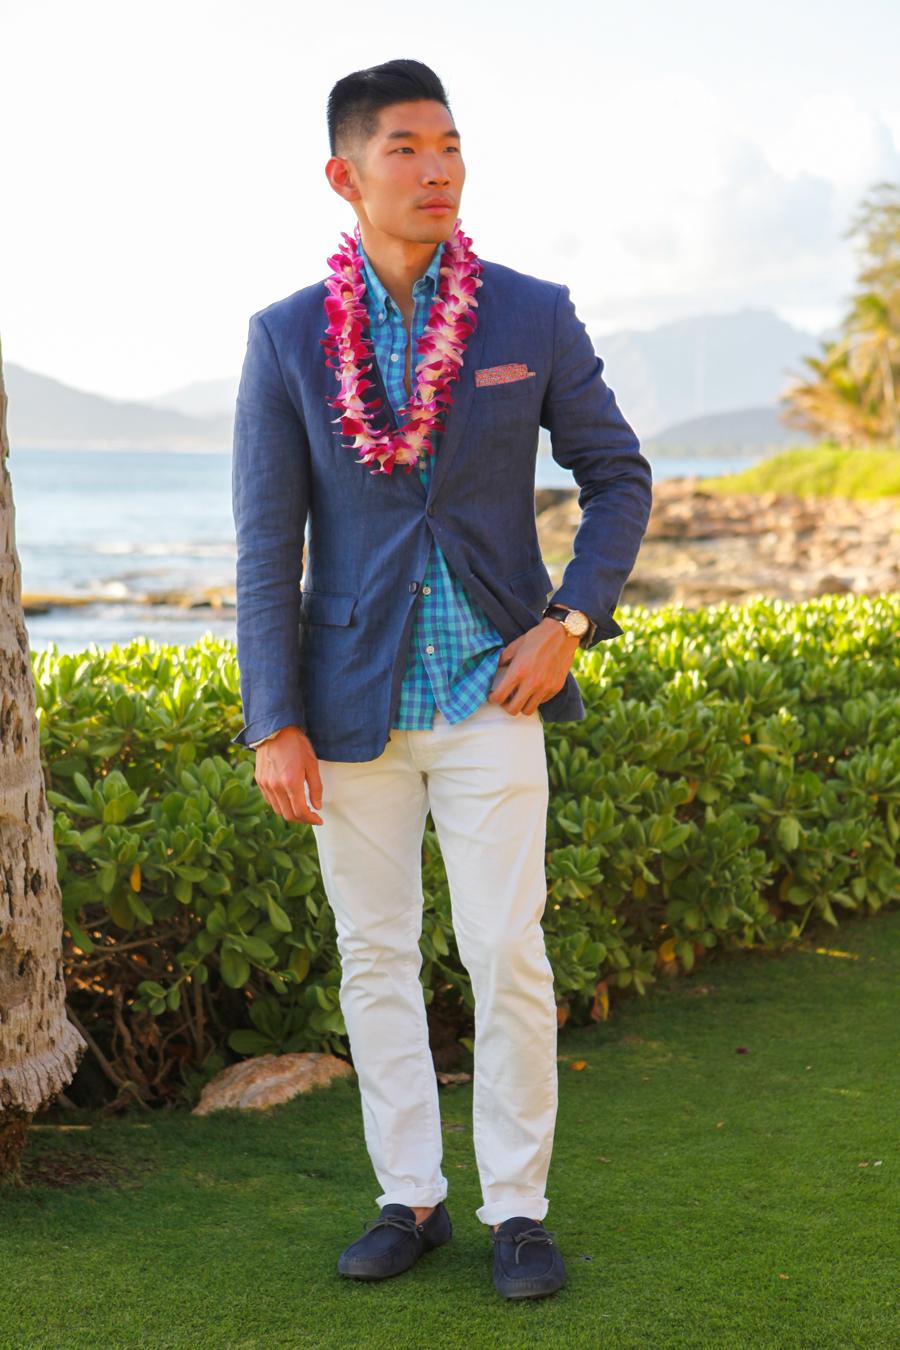 Levitate Style - Luau Oahu, Hawaii | Luau feat Hawaii Summer Style Dinner Outfit, Levitate Travel